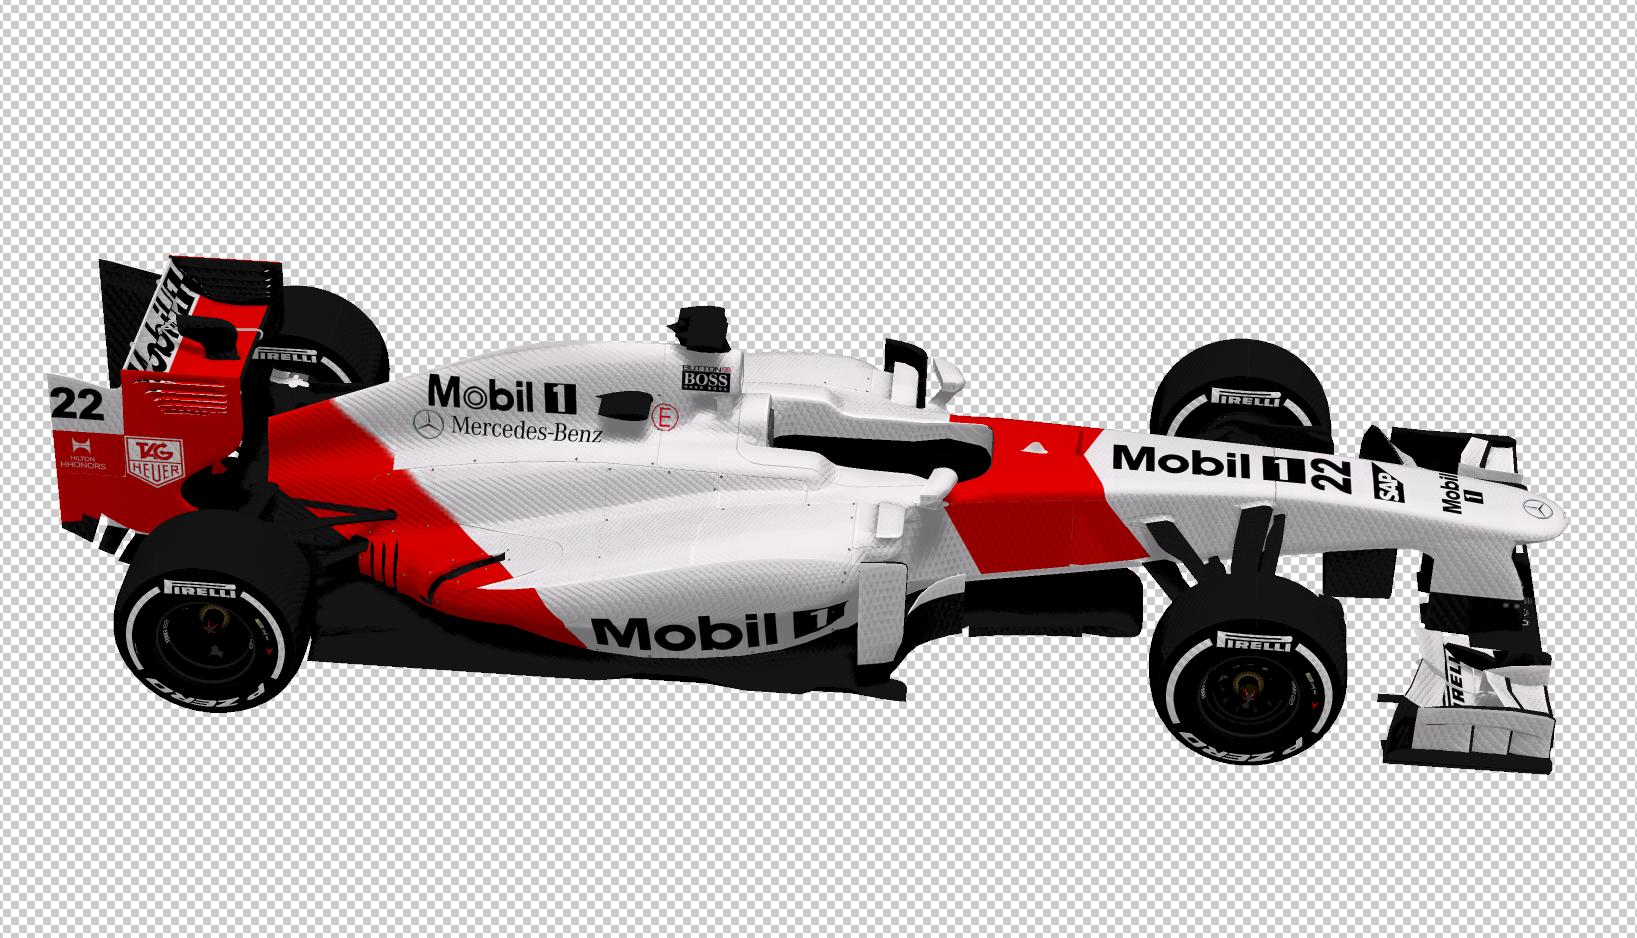 McLaren 1994 - 2014 Edition.PNG